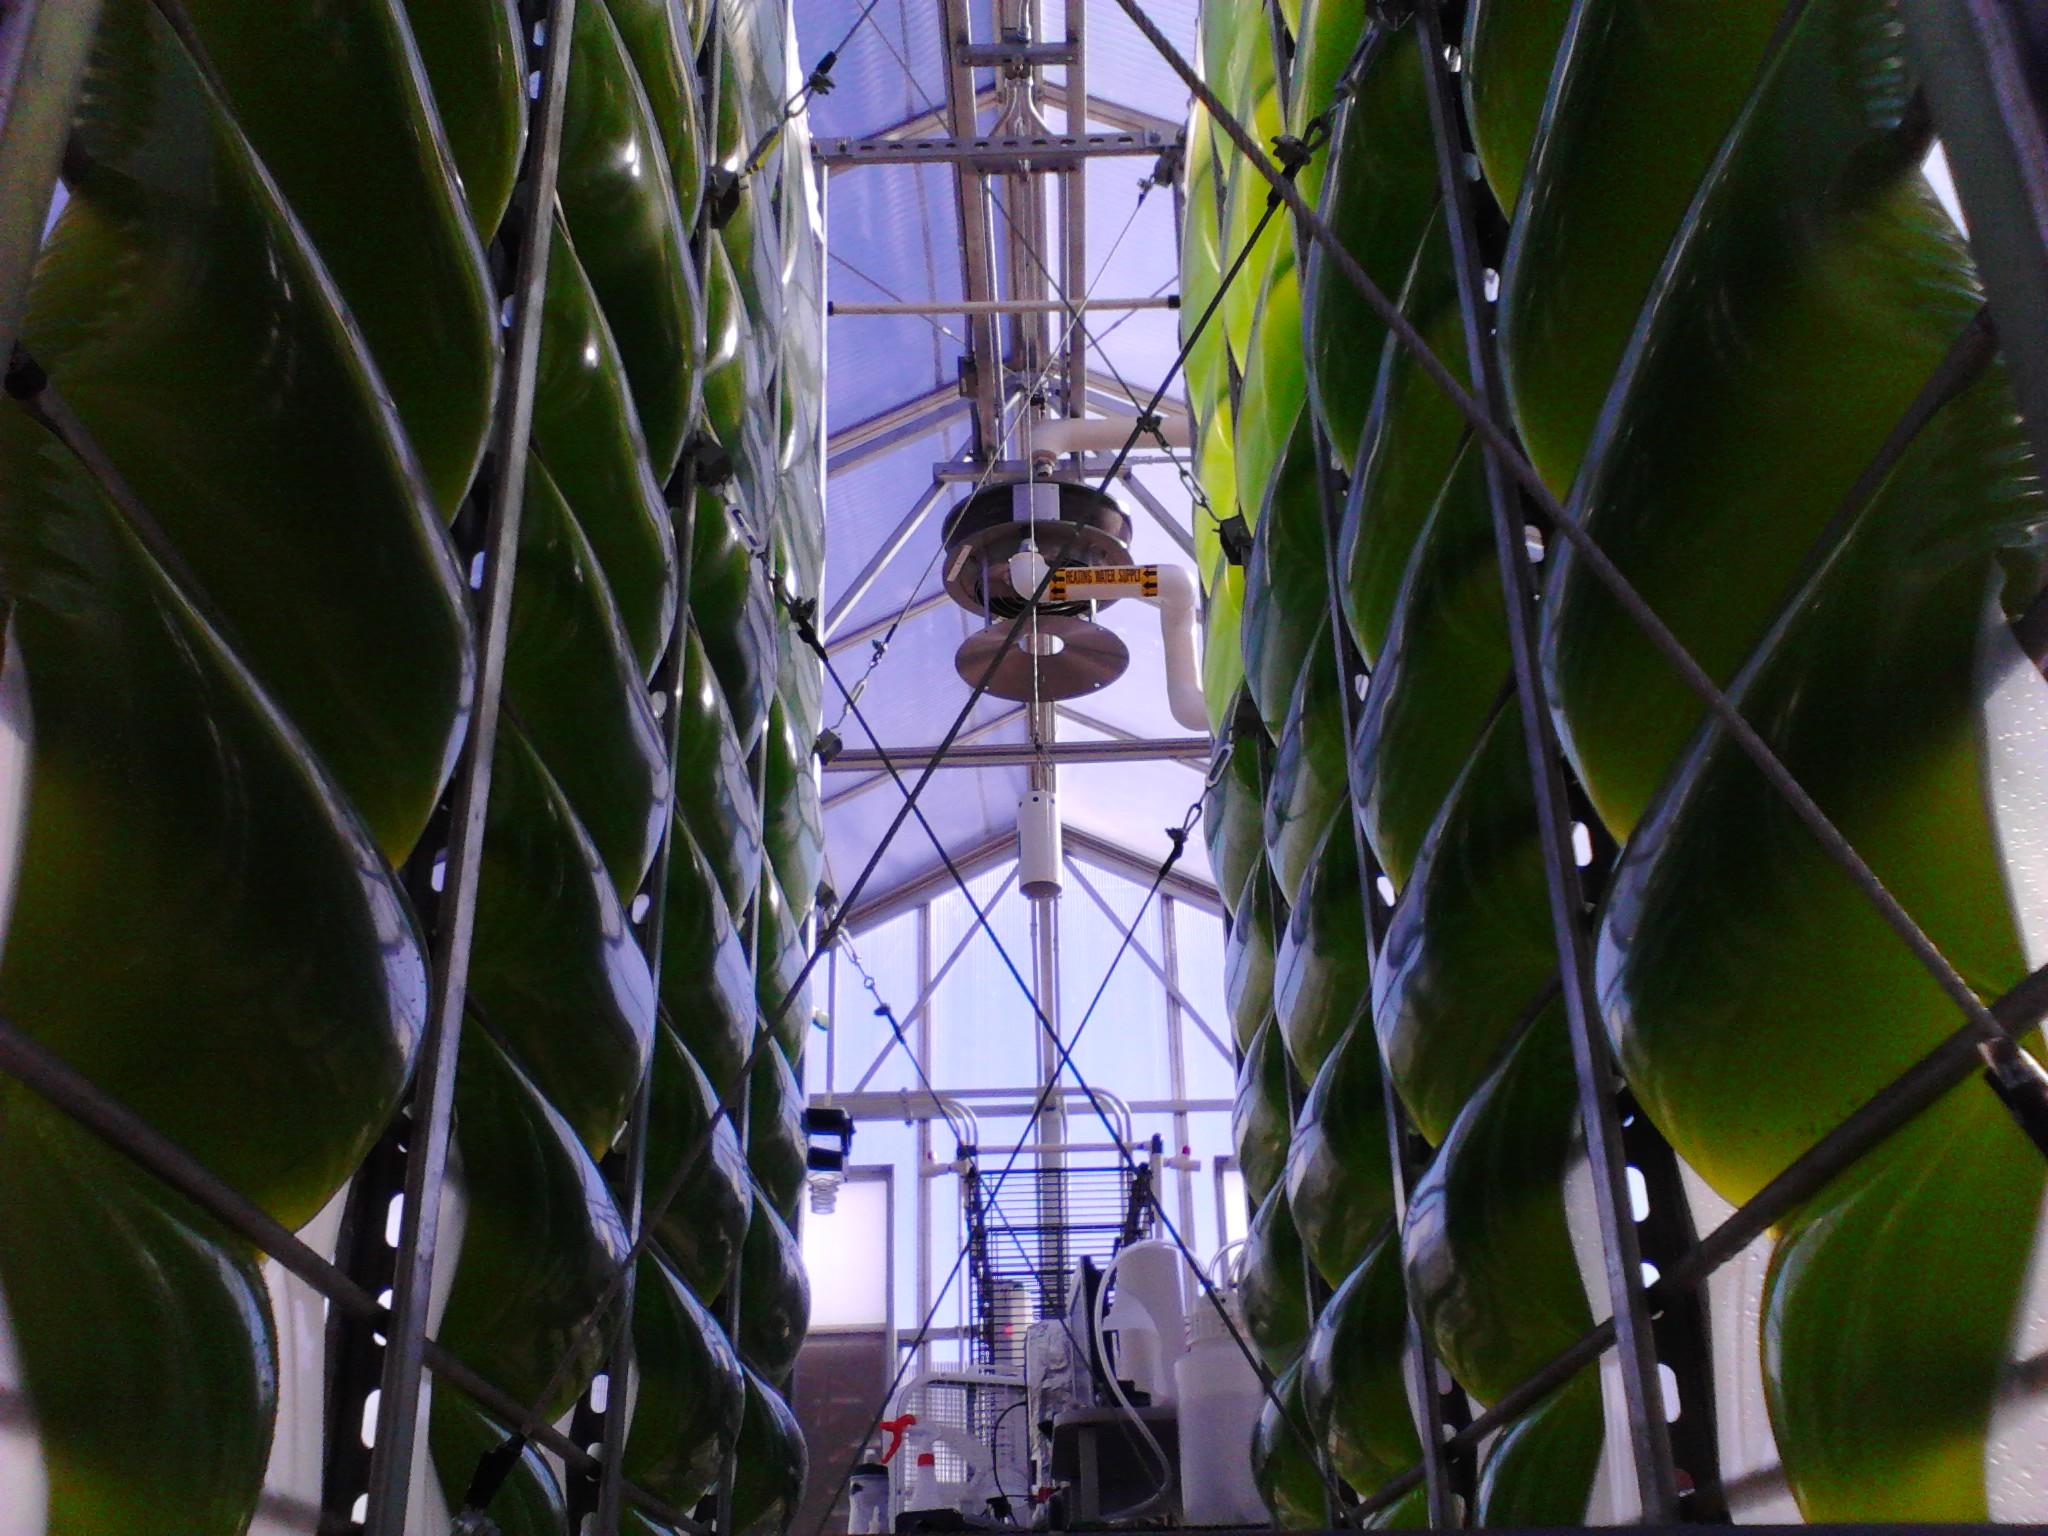 The Air-Accordion Photobioreactor